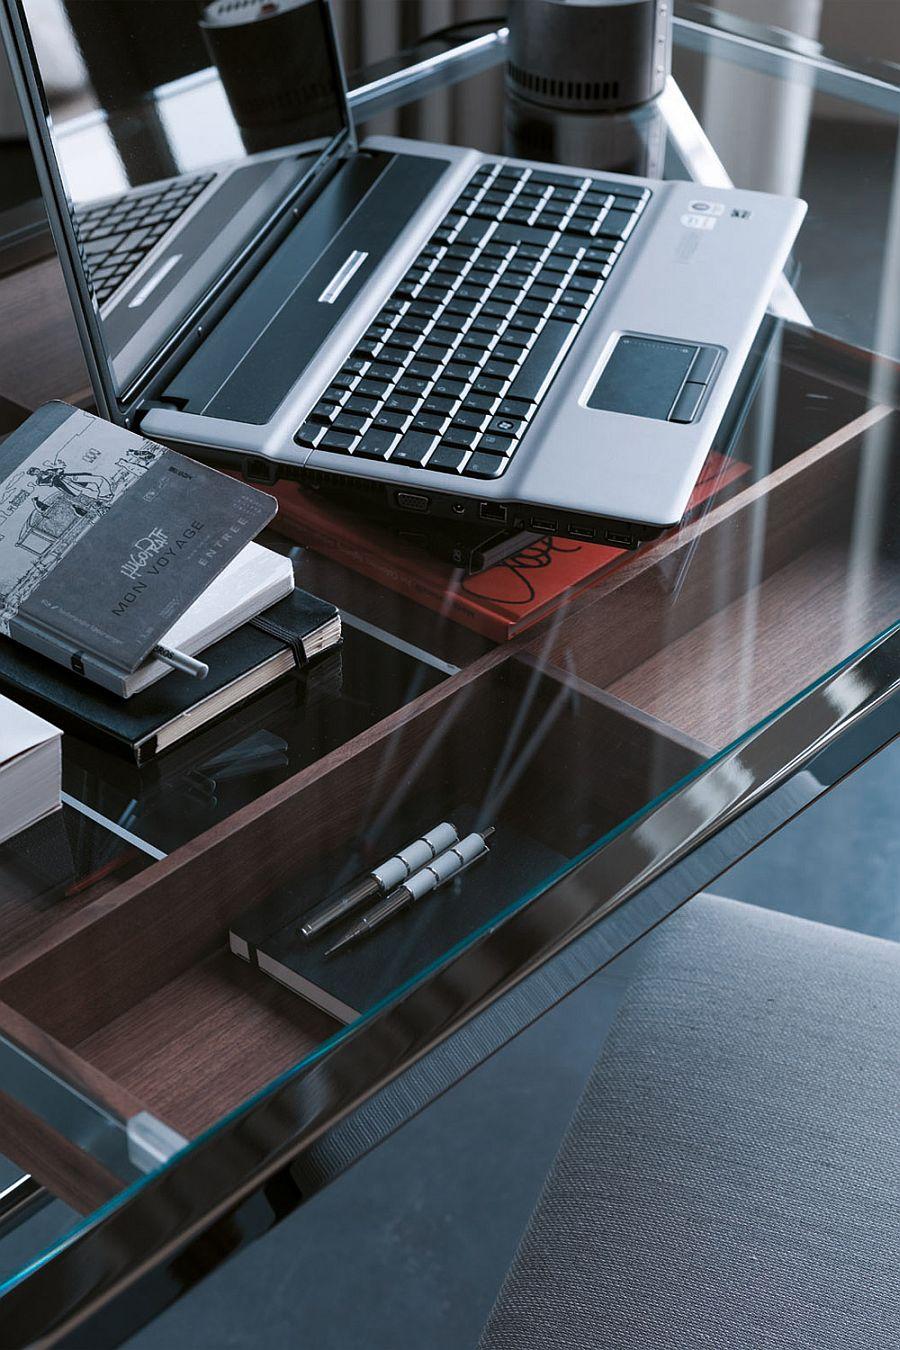 Walnut drawer of the desk under the glass desk top